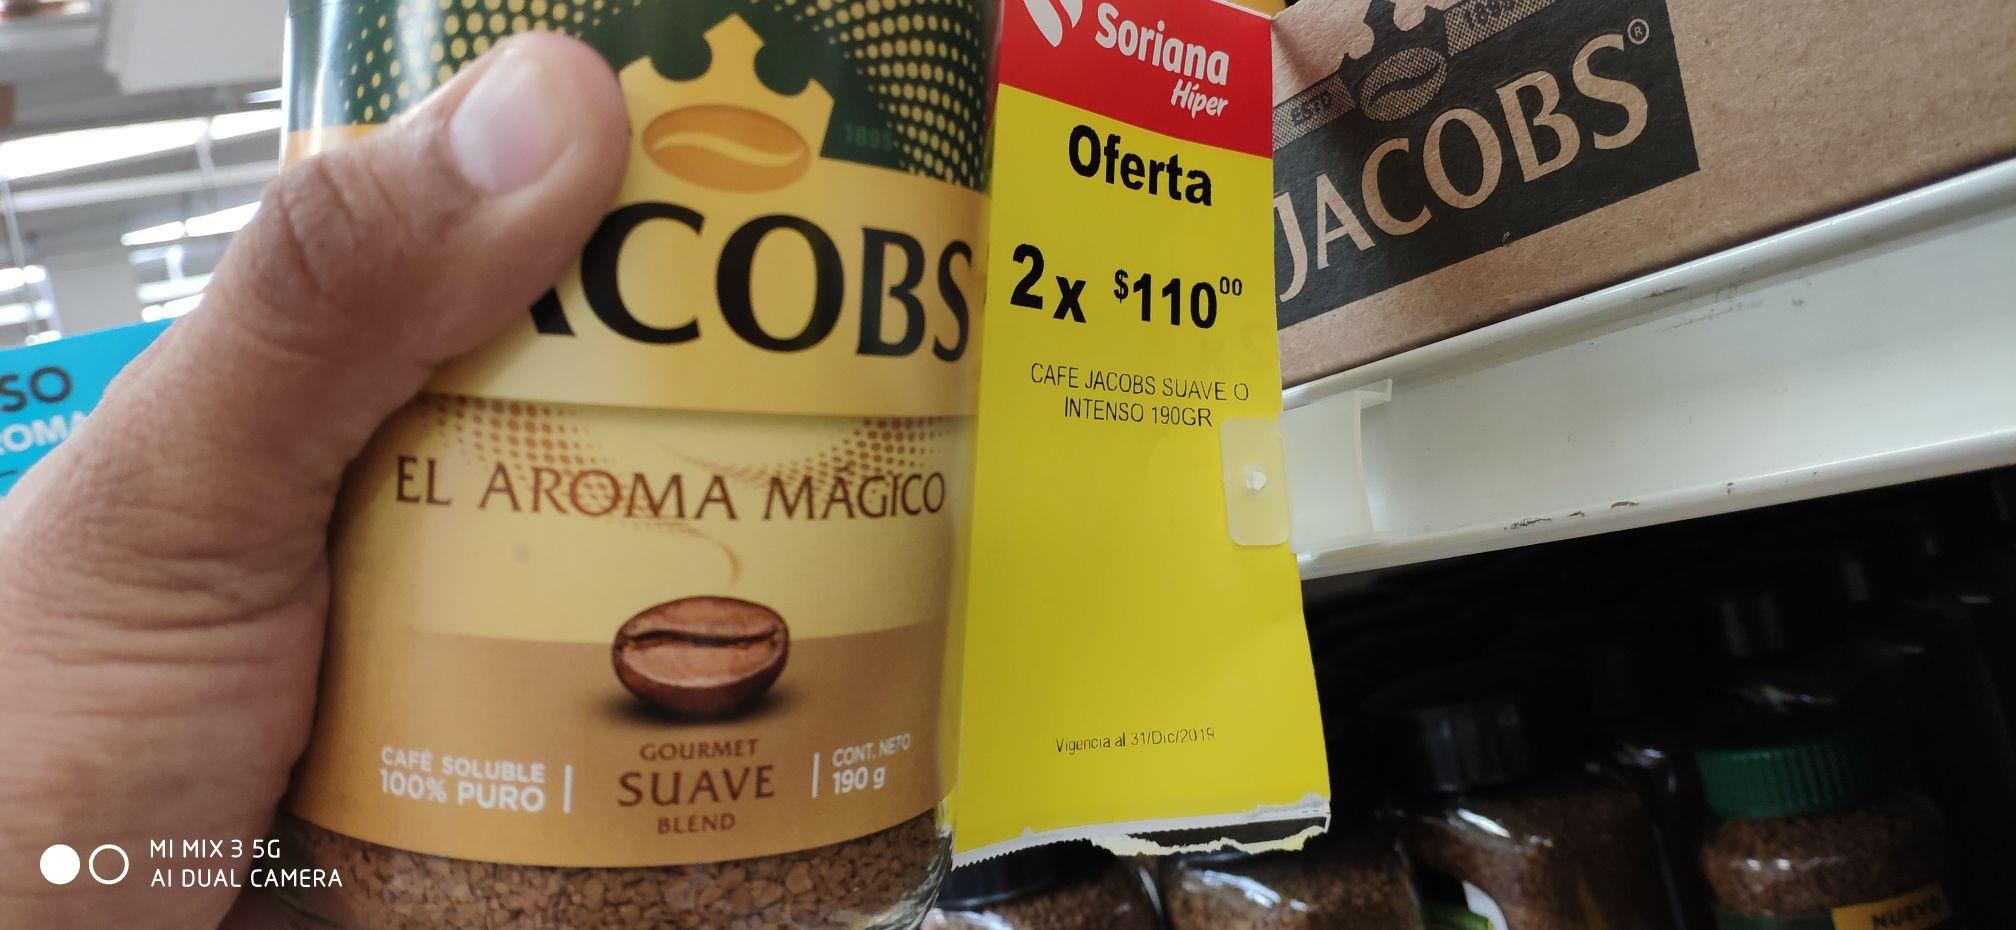 Soriana Café Jacobs Intenso 190 gramos